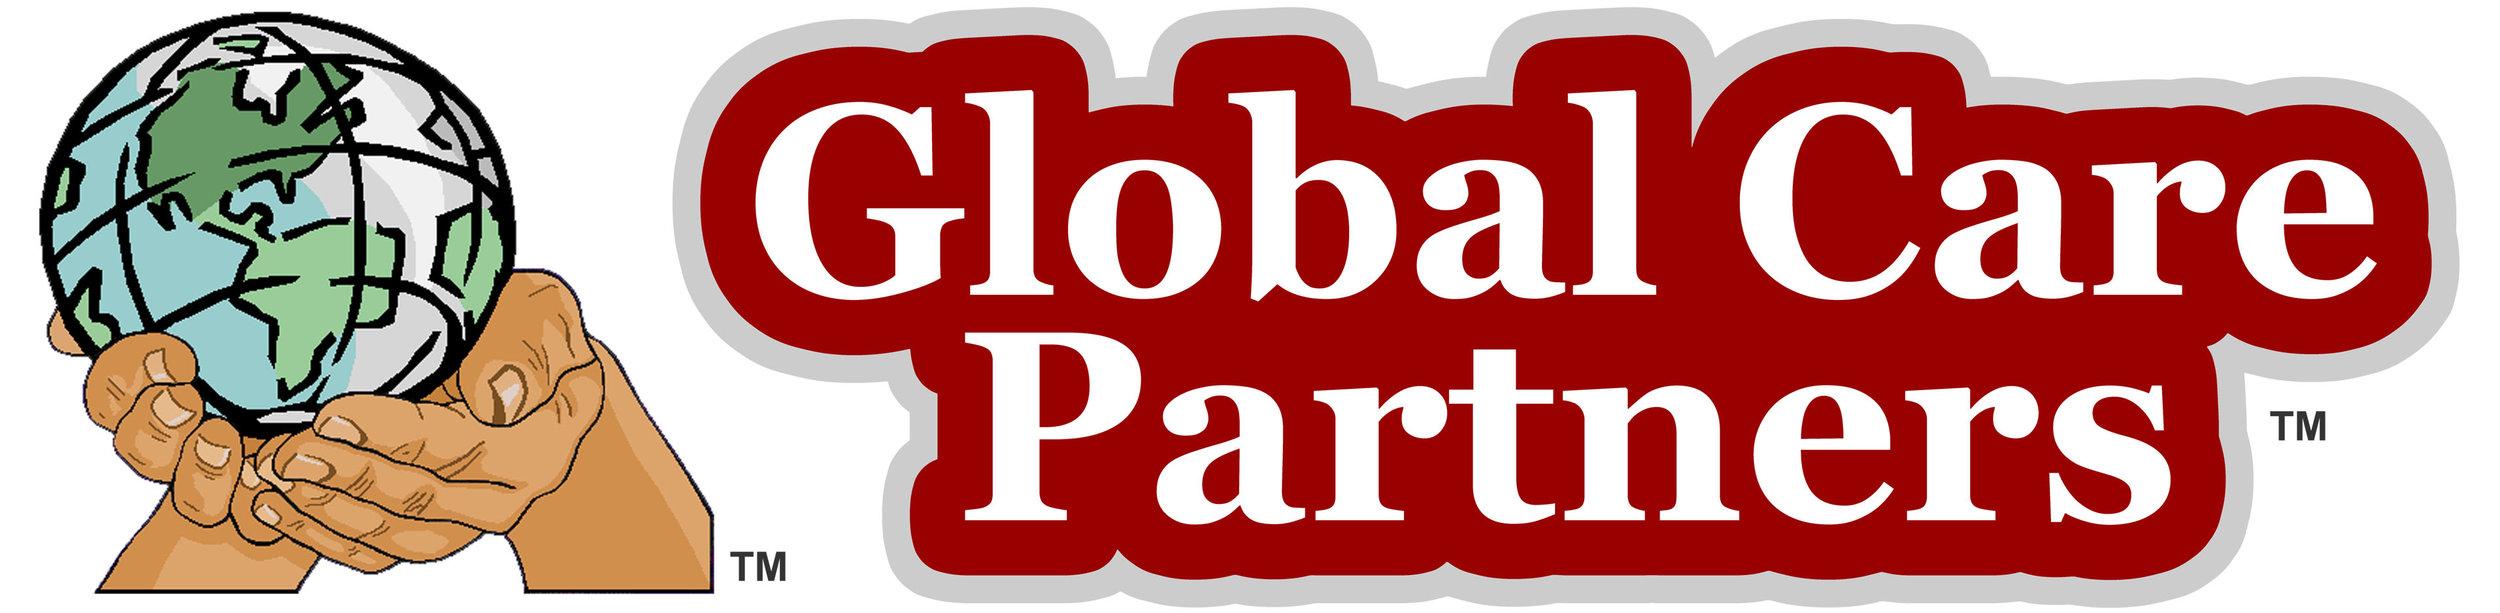 Global Care Partners-best.jpg